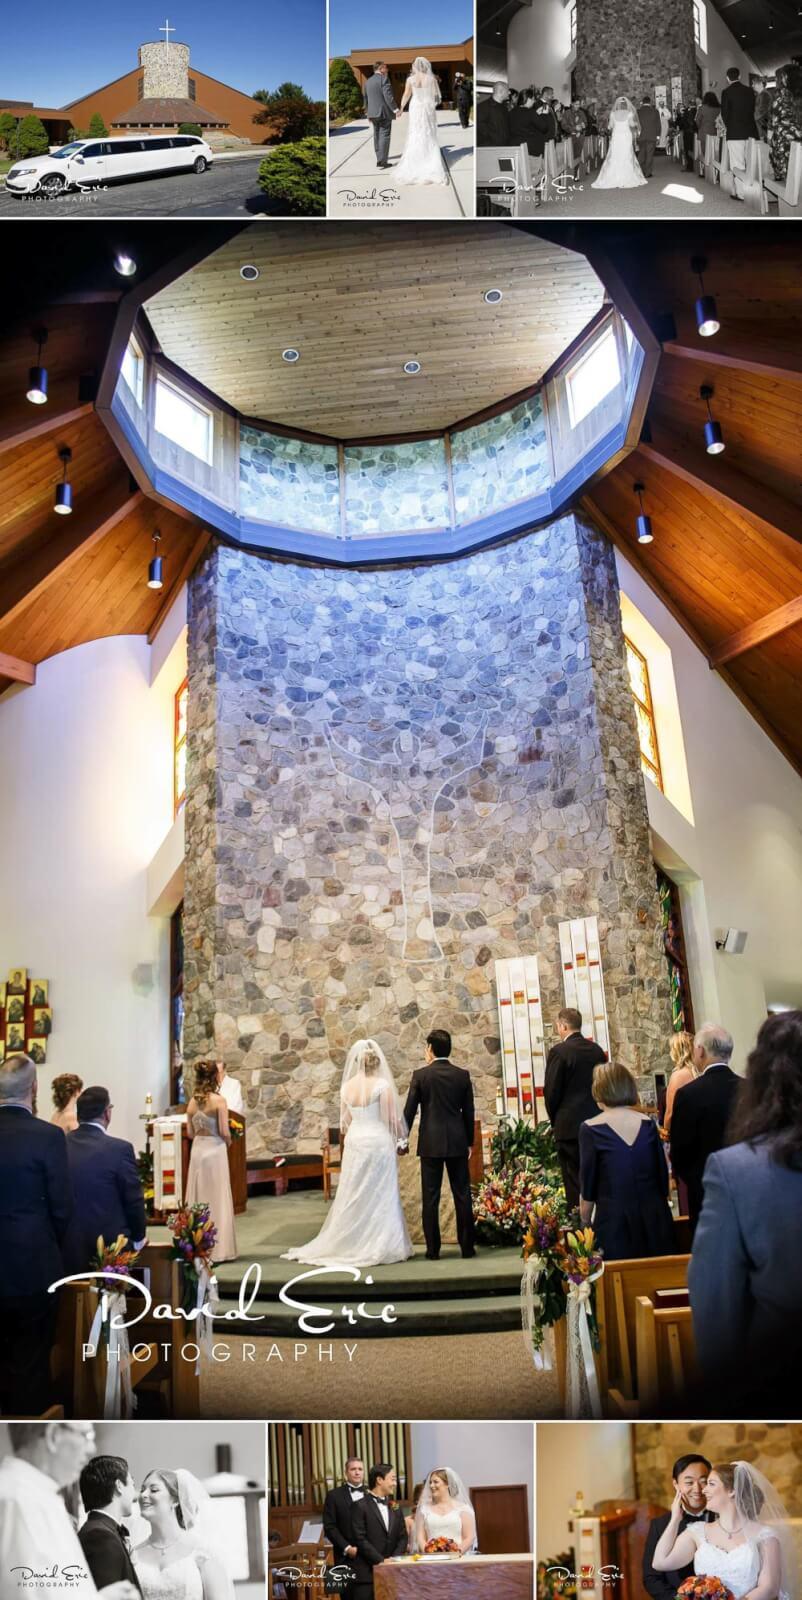 Lake Valhalla Club photos of the ceremony at Resurrection Parish